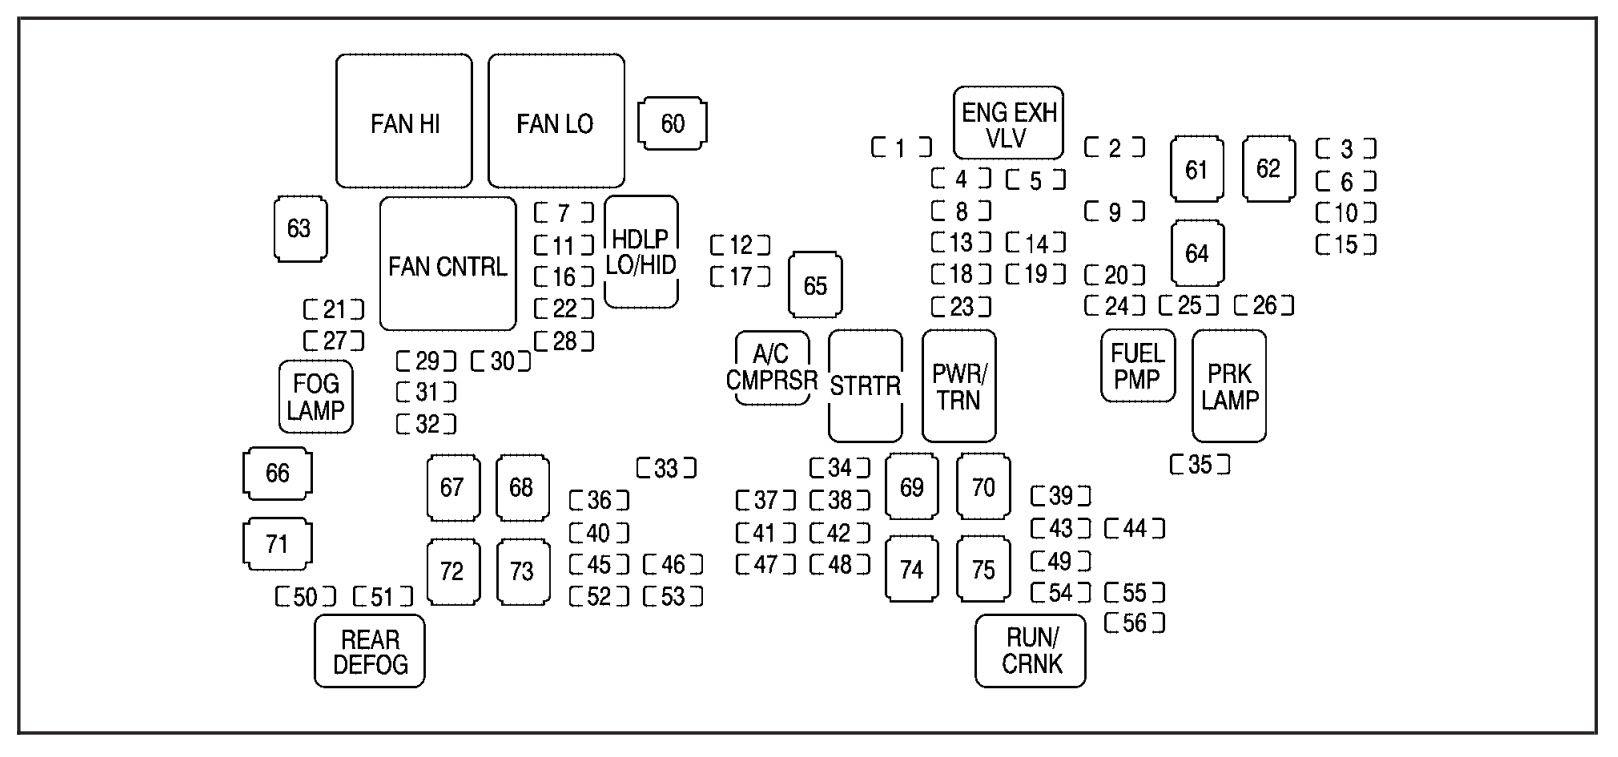 Gmc Yukon 2007 Fuse Box Diagram Auto Genius